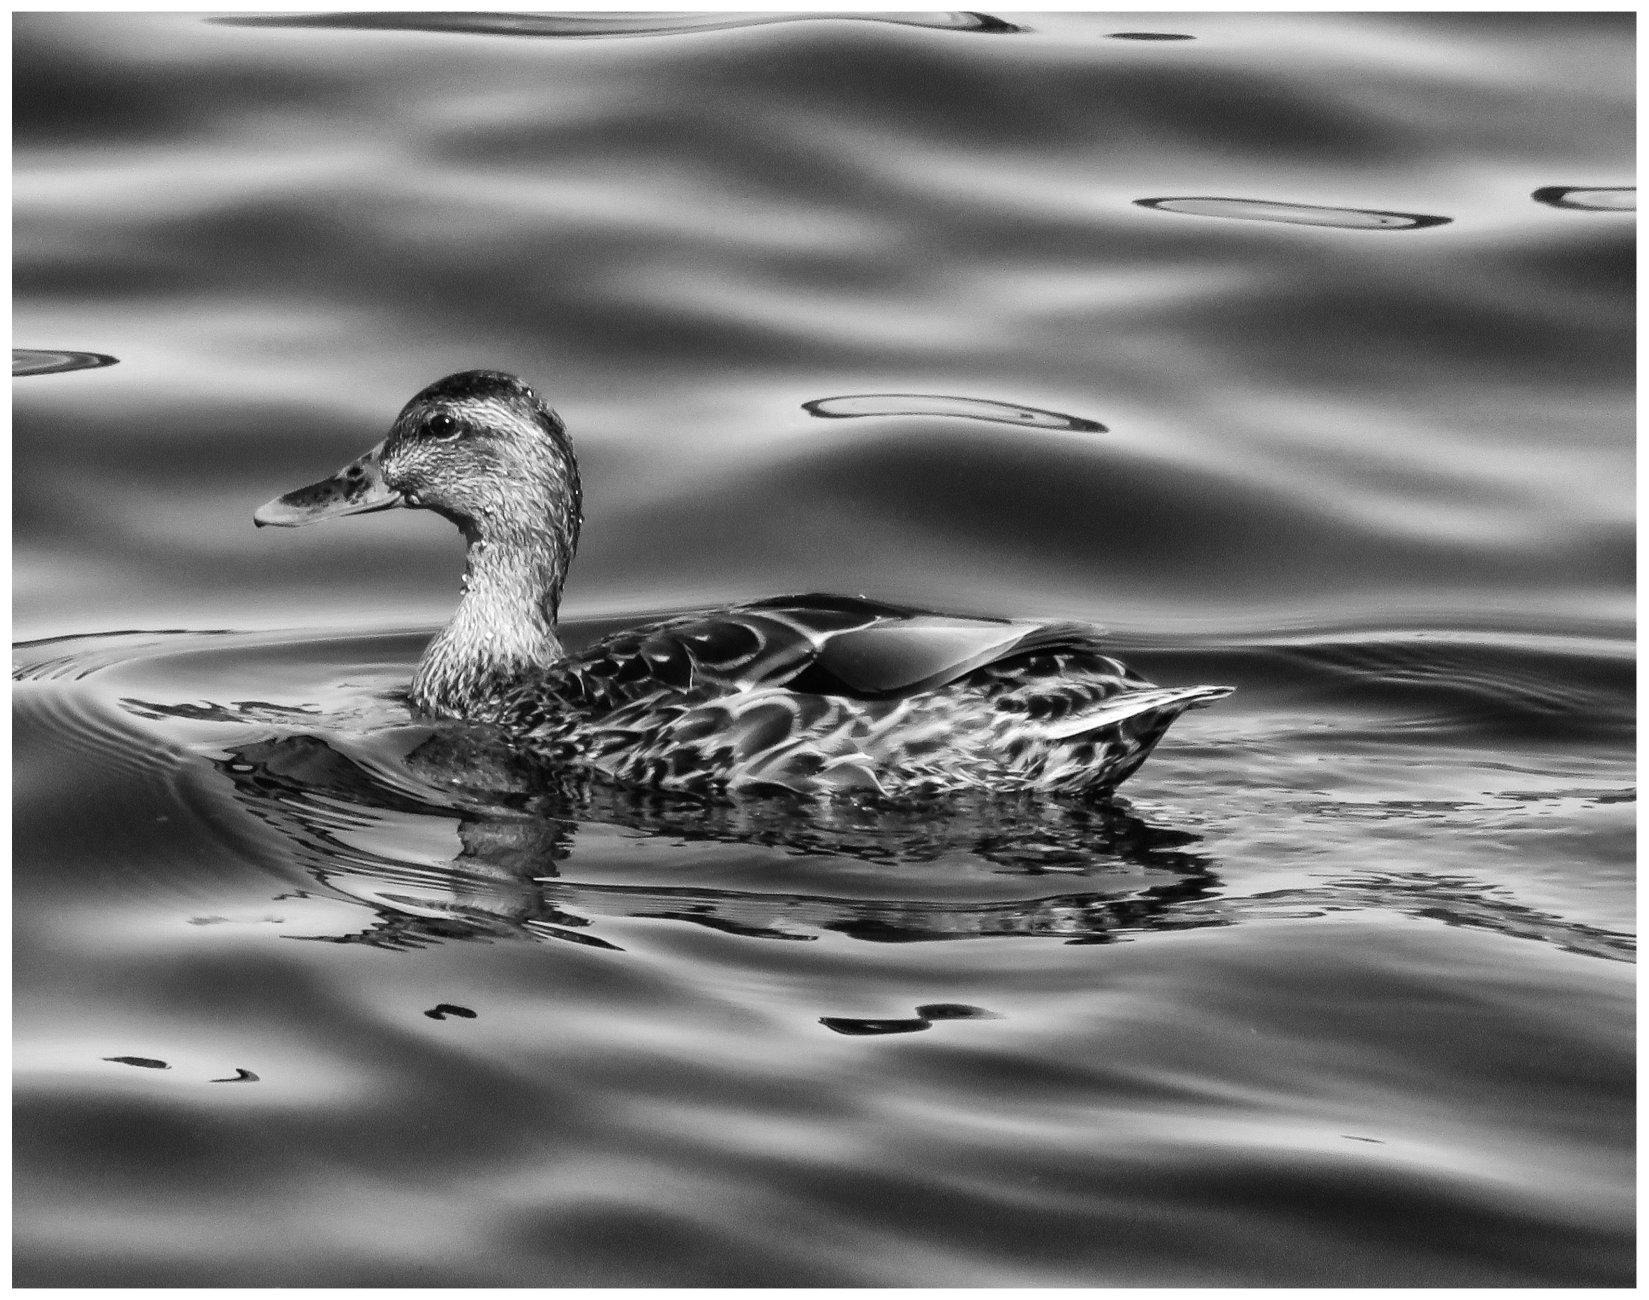 A Female Mallard On Silky Water